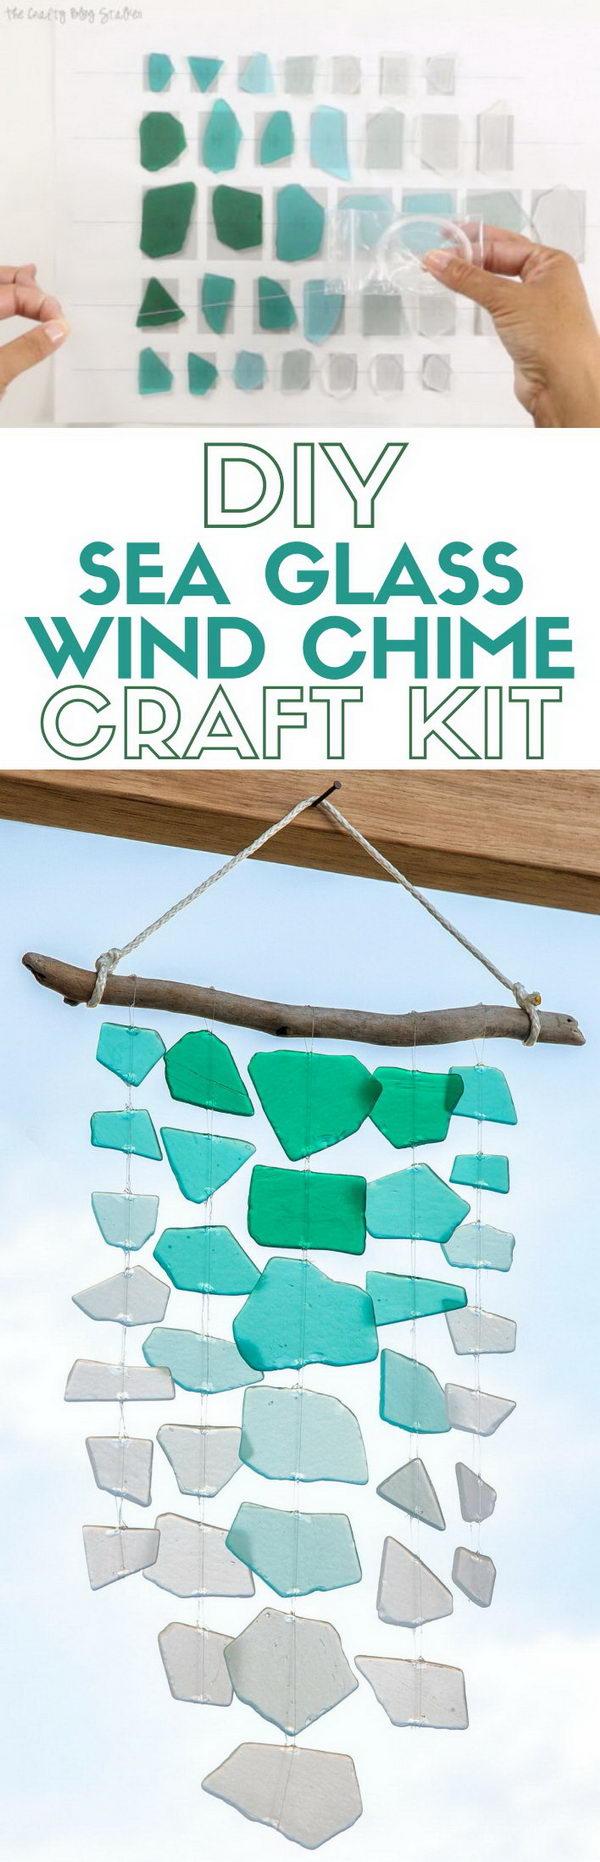 DIY Sea Glass Wind Chime.